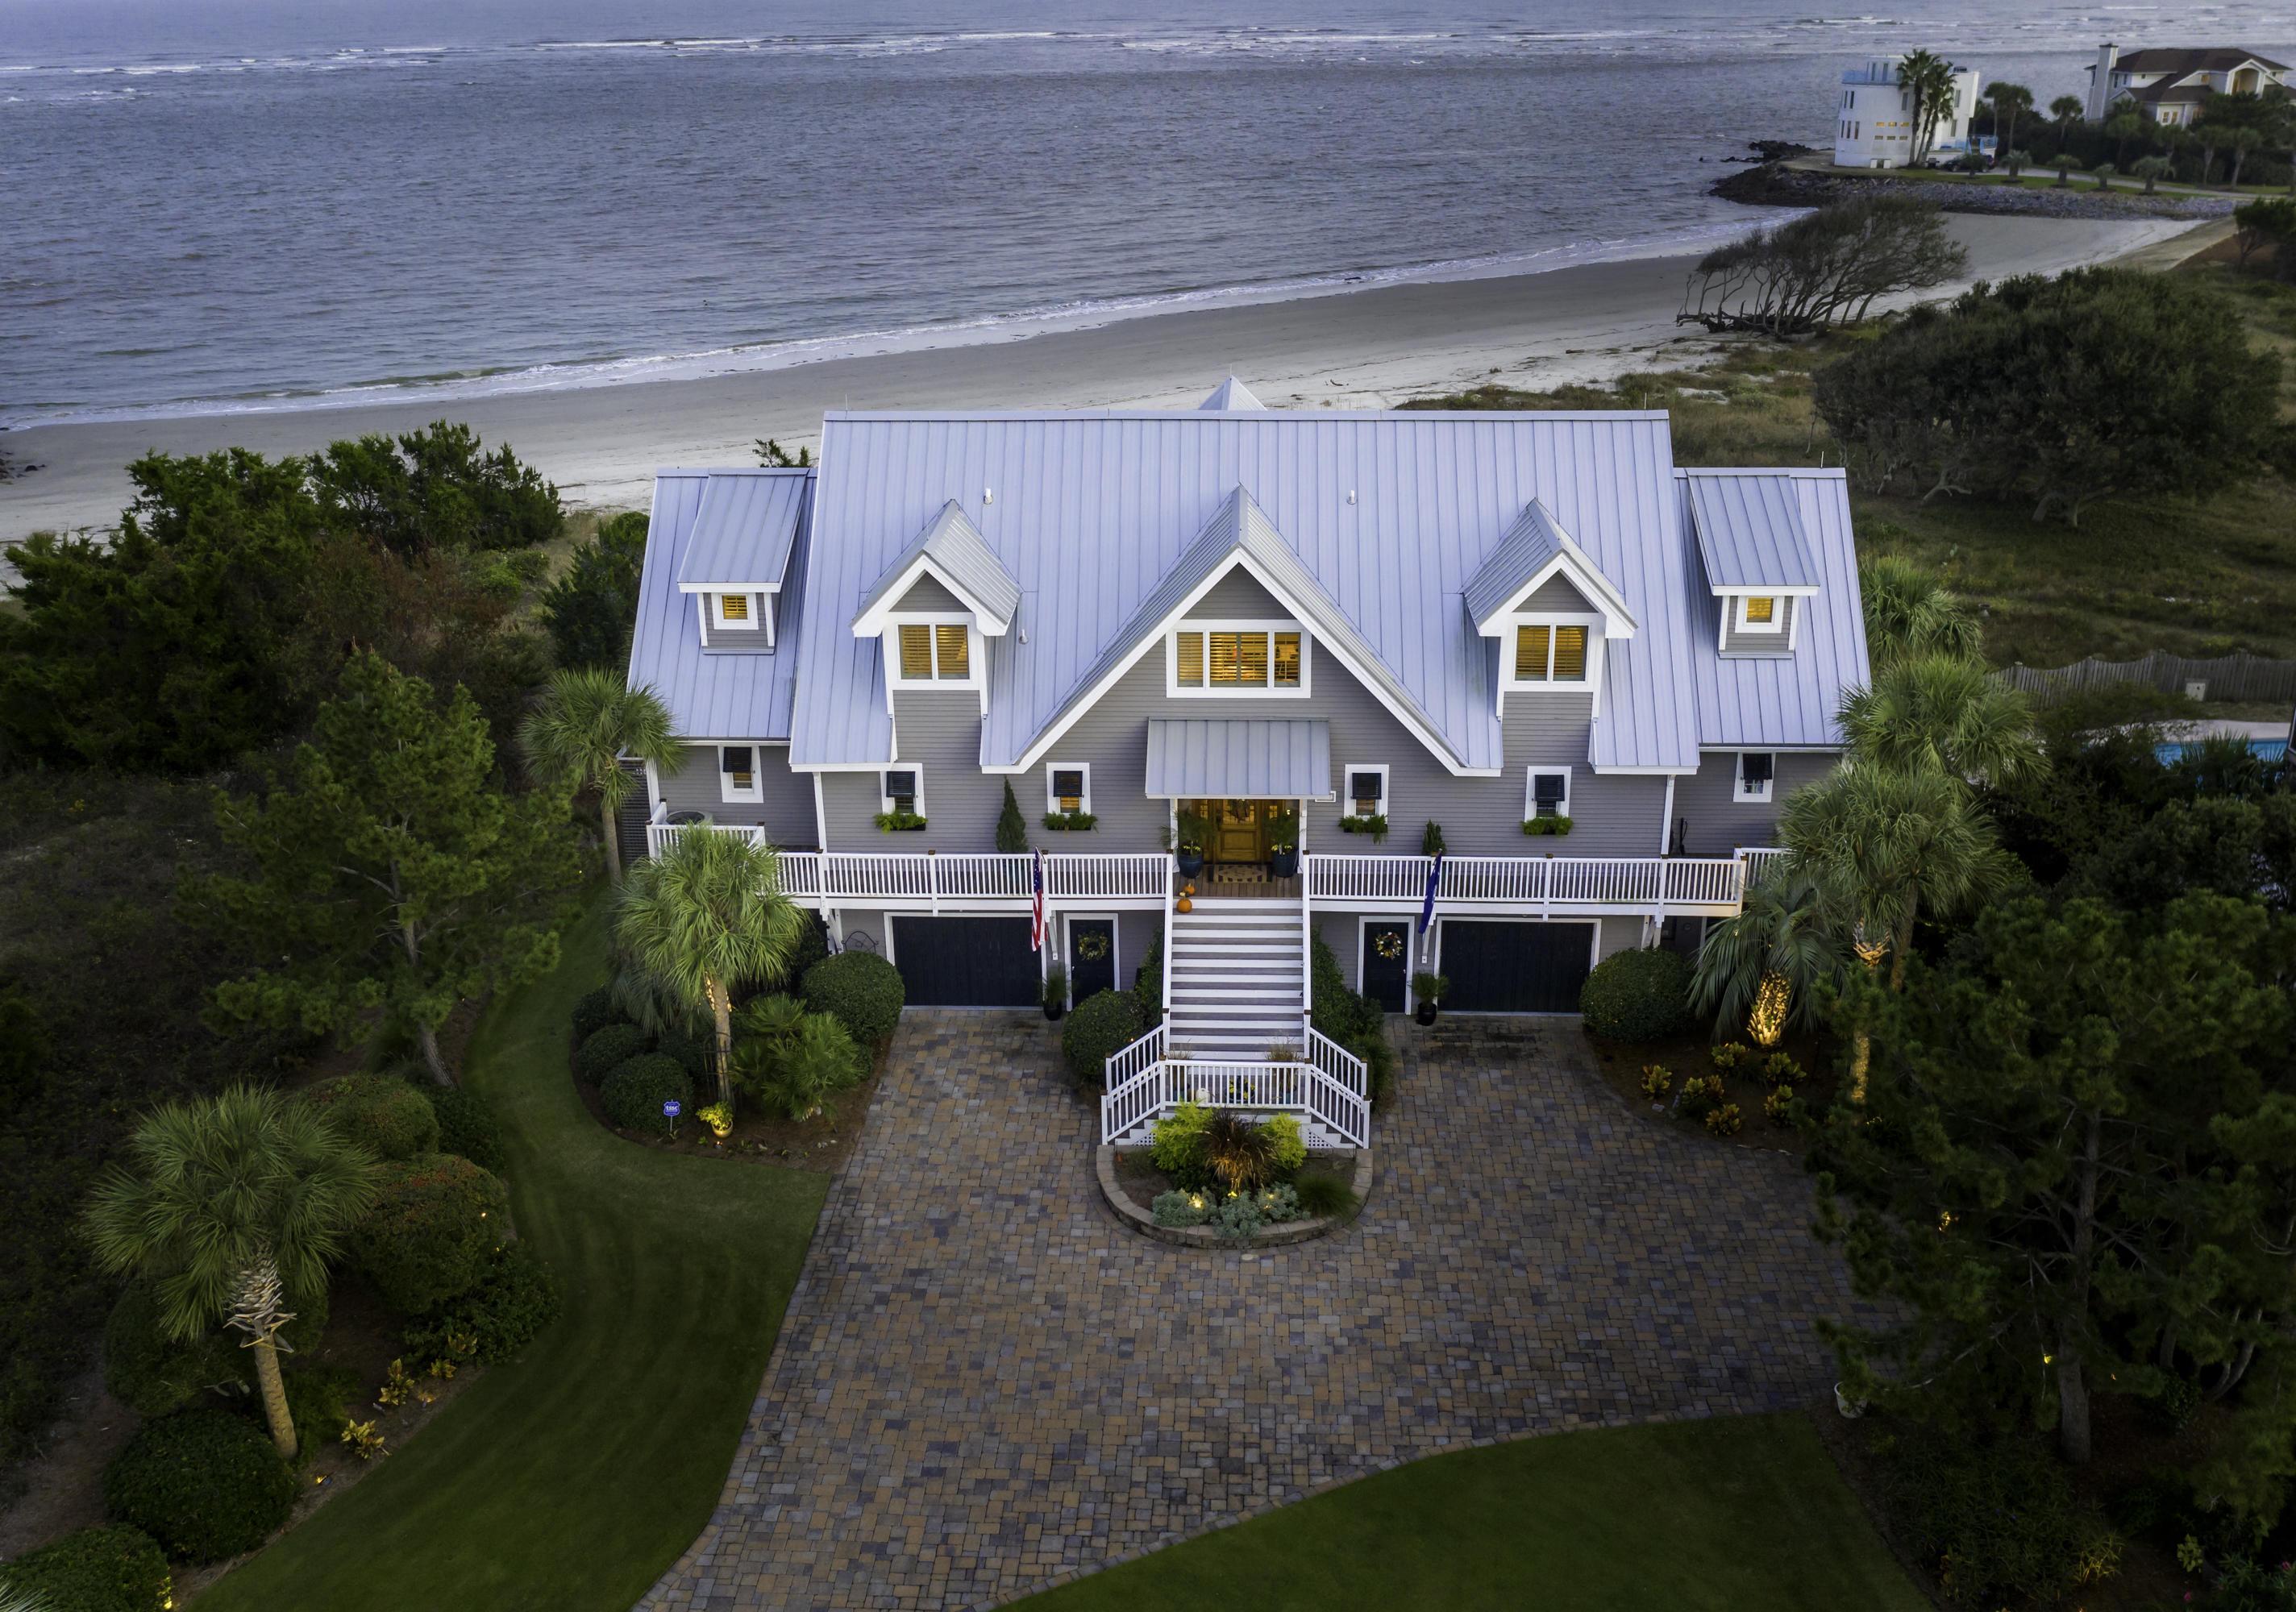 Sullivans Island Homes For Sale - 3217 Middle, Sullivans Island, SC - 12